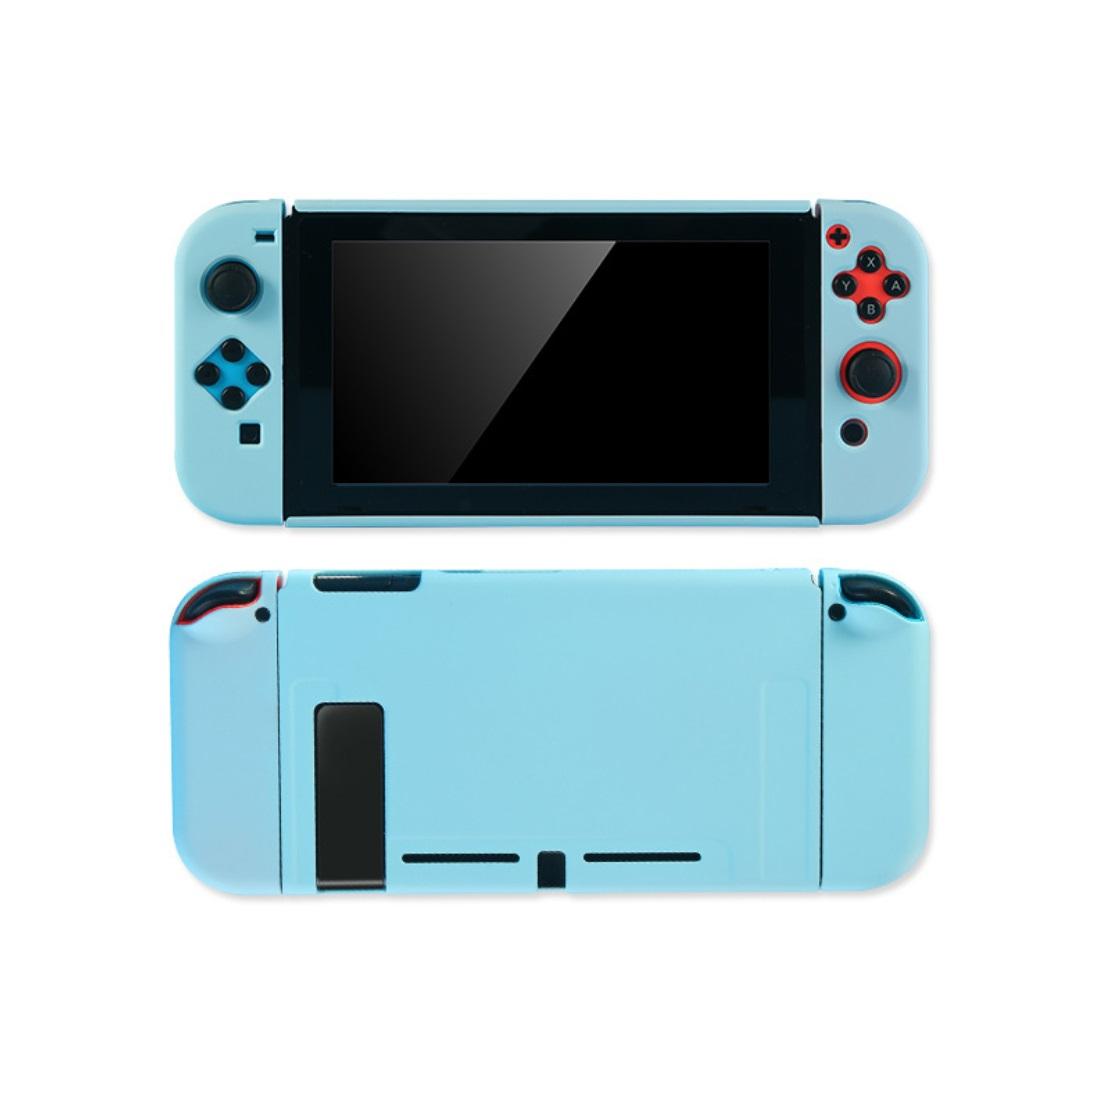 For Switch Host Plastic Split Protective Case Shell Cover Solid Color 17cm x 11cm x 3cm blue